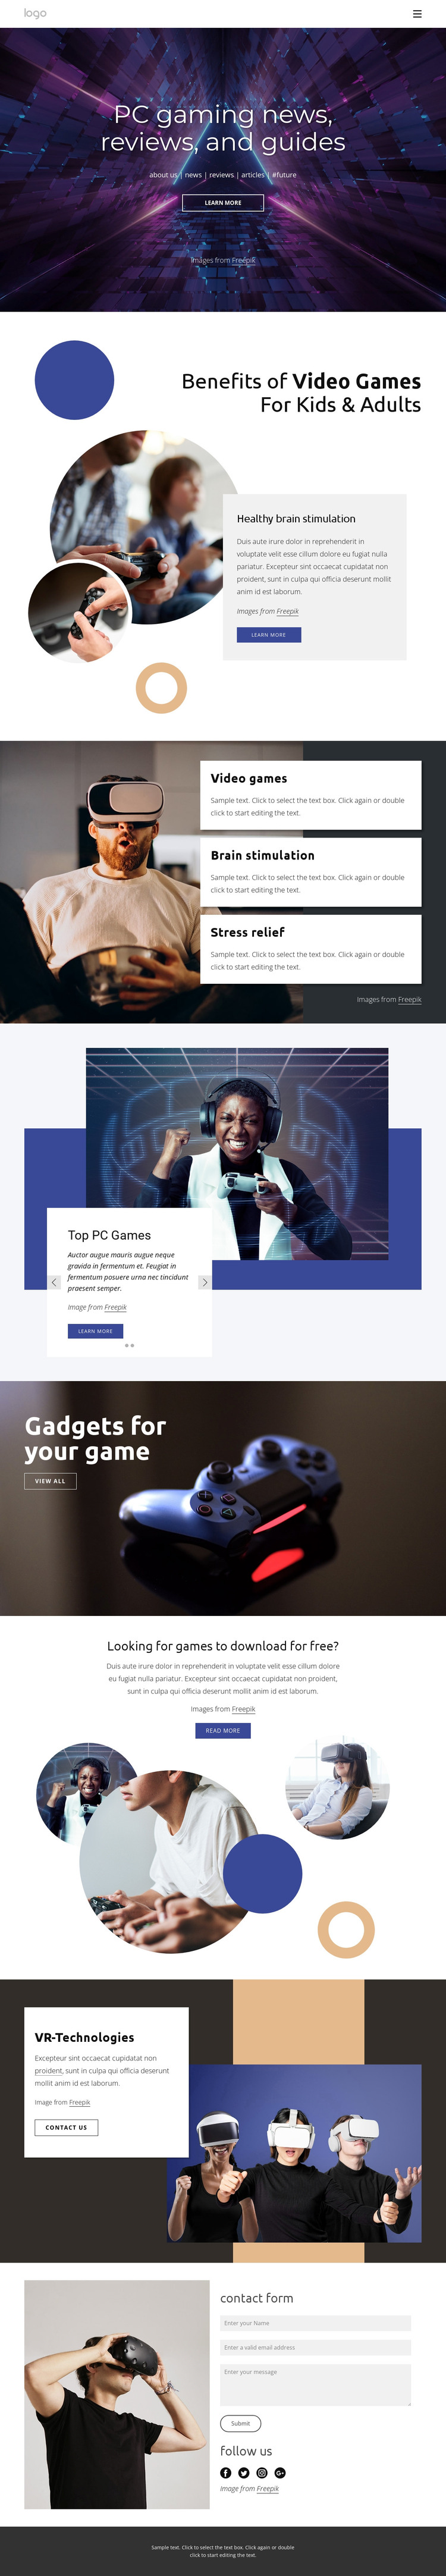 PC gaming news Web Design